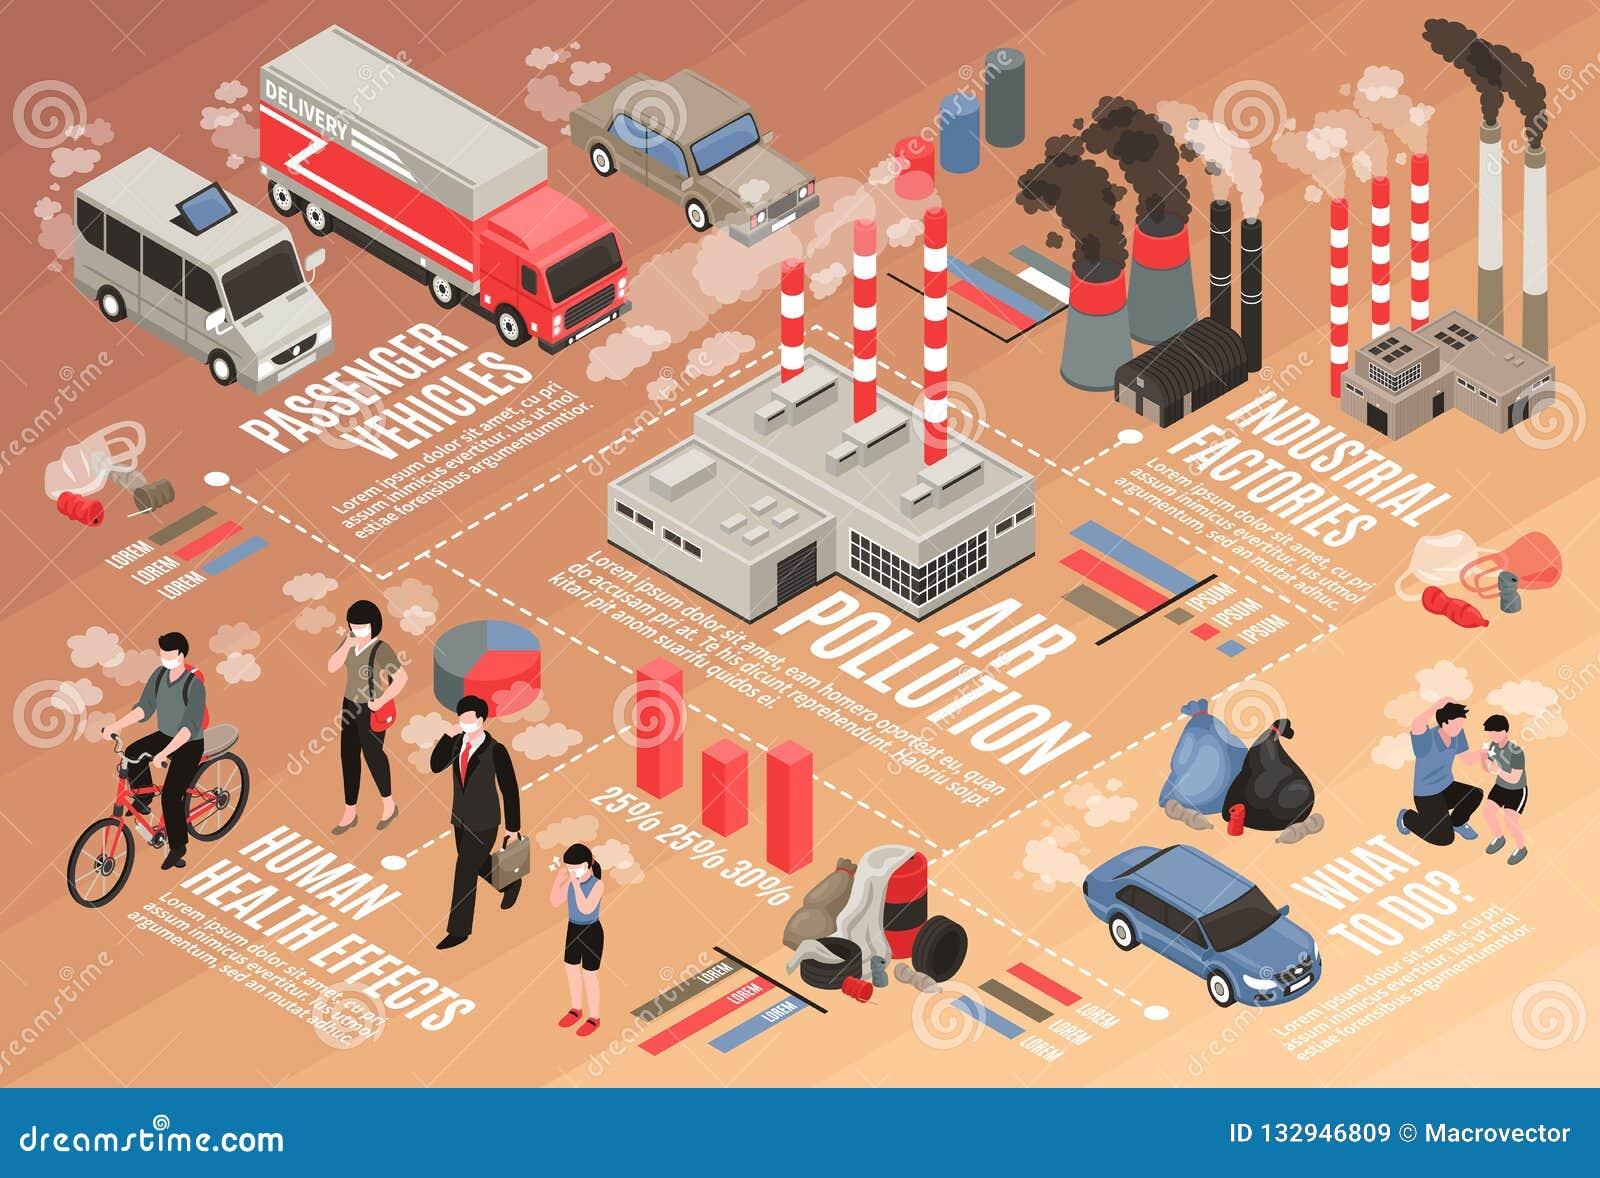 Luchtvervuilings Isometrisch Stroomschema